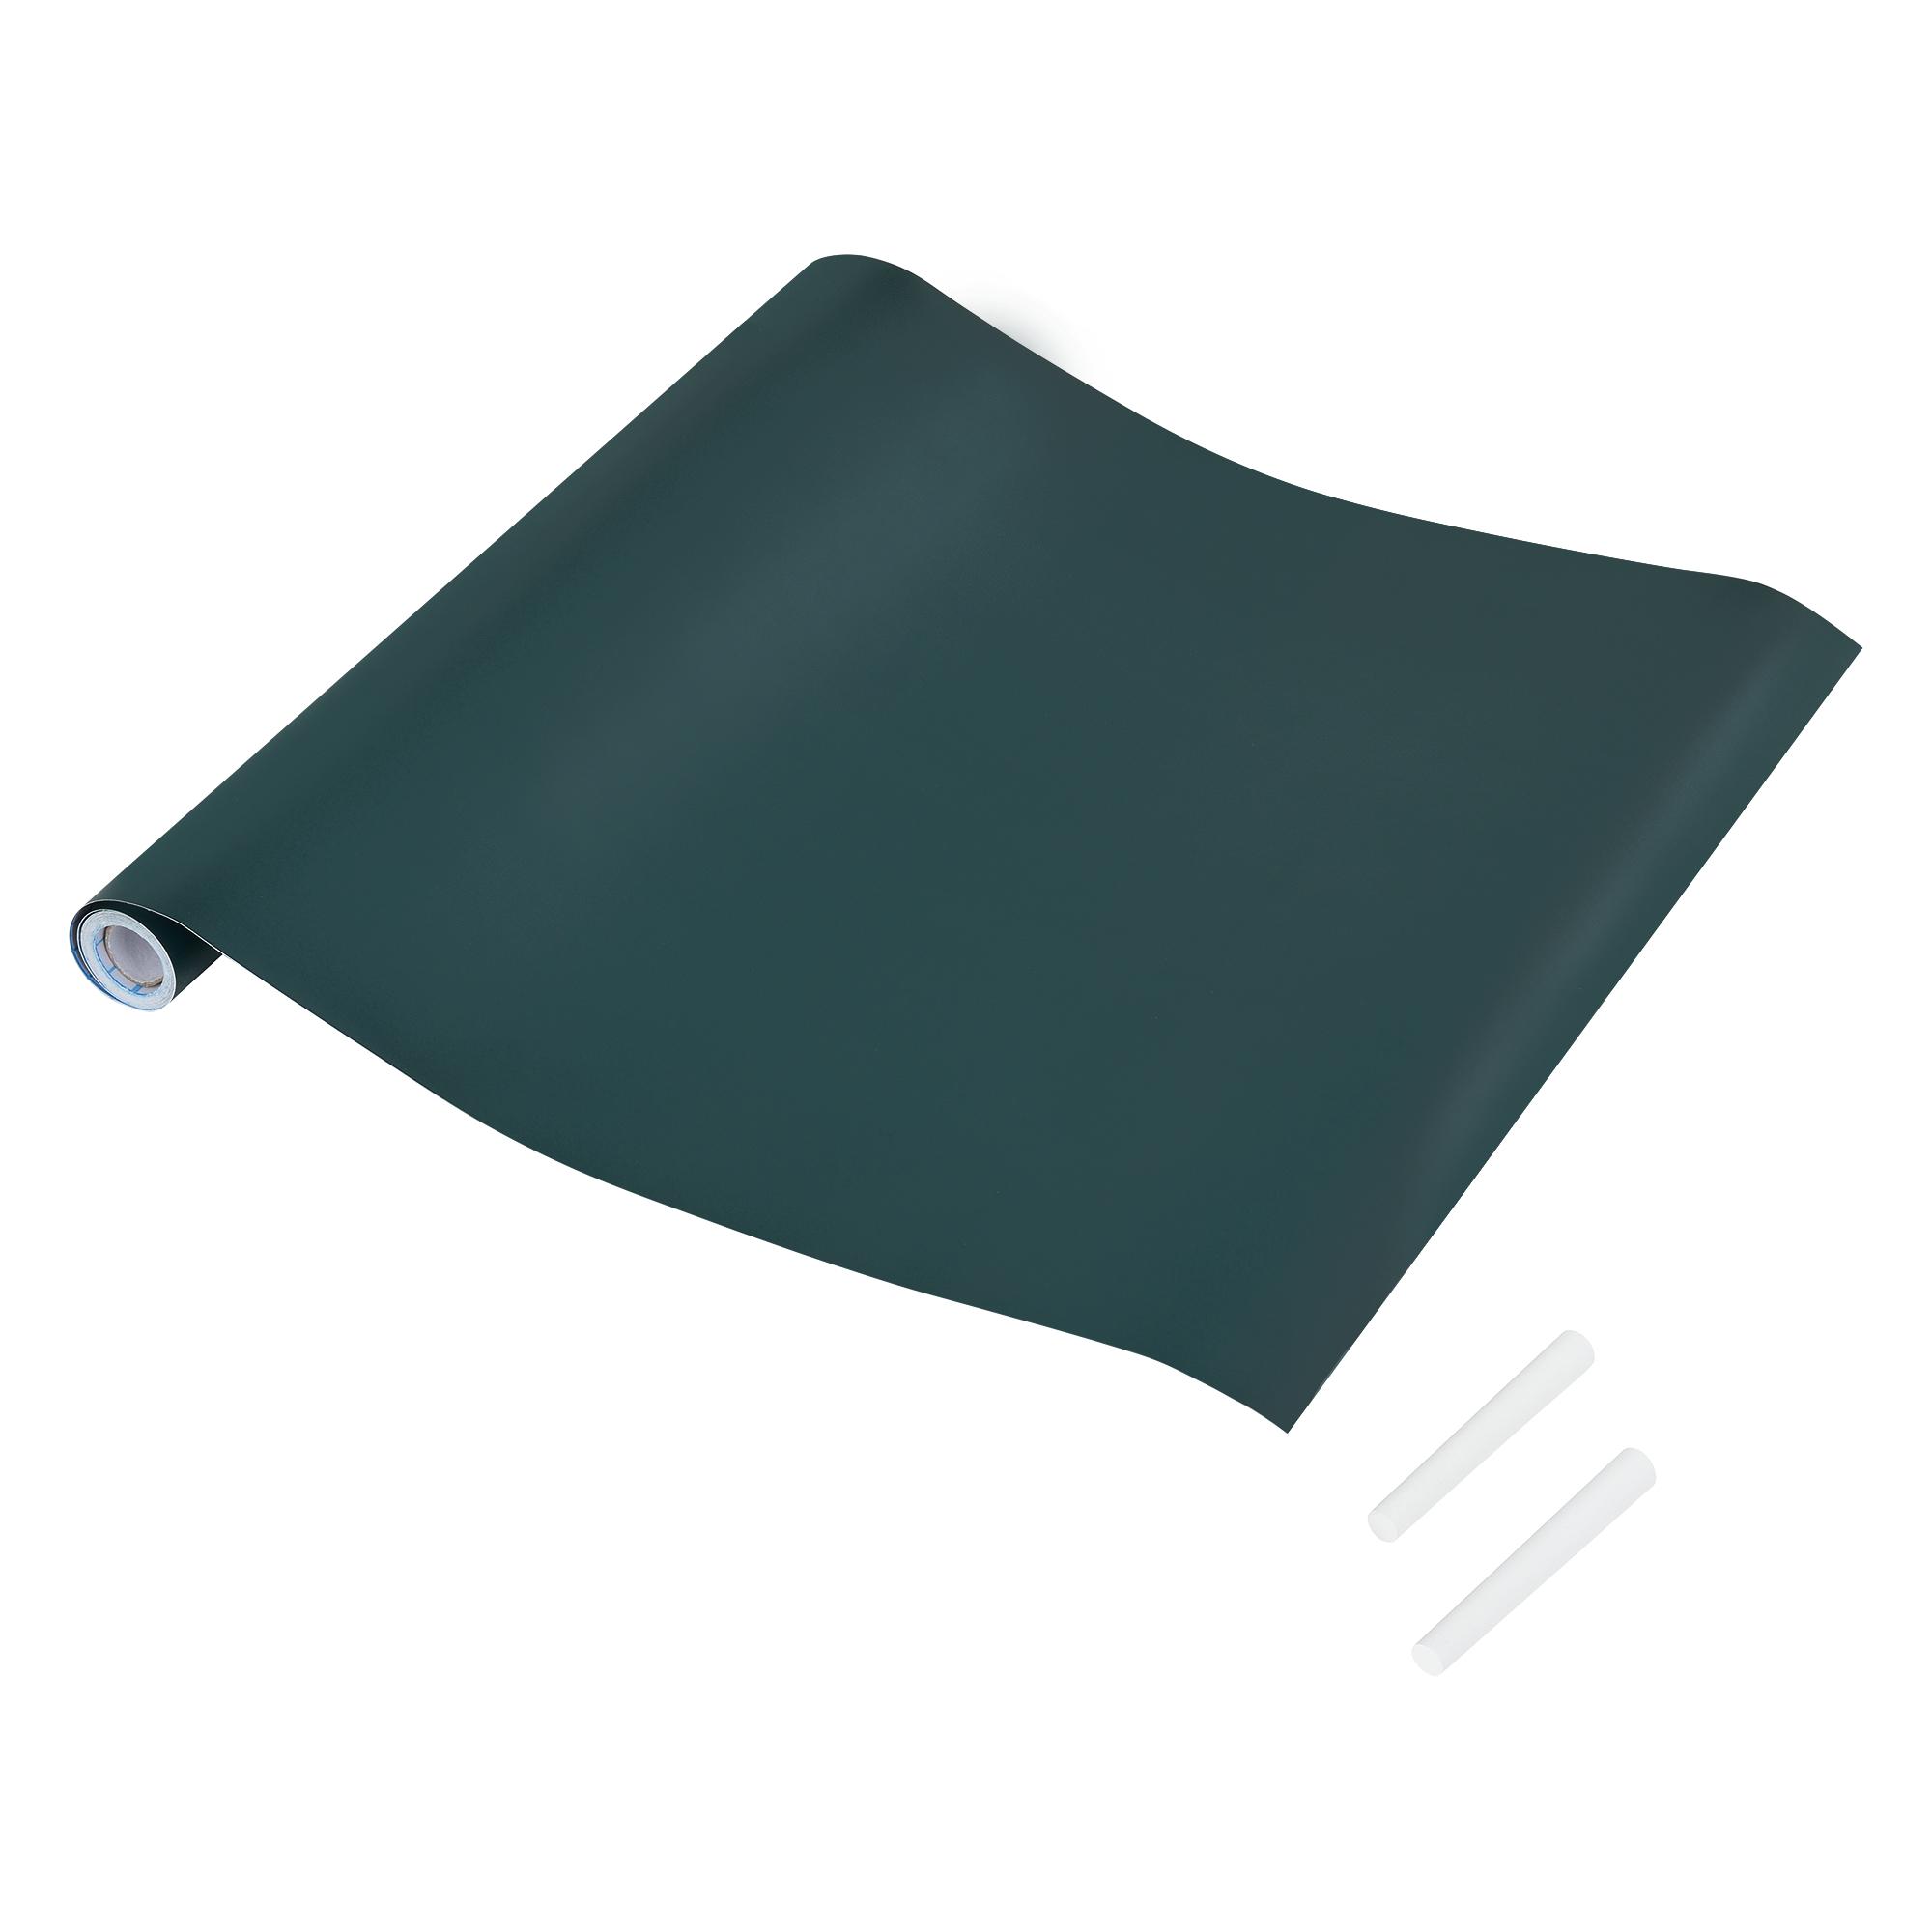 tafelfolie schwarz gr n selbstklebend 40x300cm kreide folie wanddeko ebay. Black Bedroom Furniture Sets. Home Design Ideas